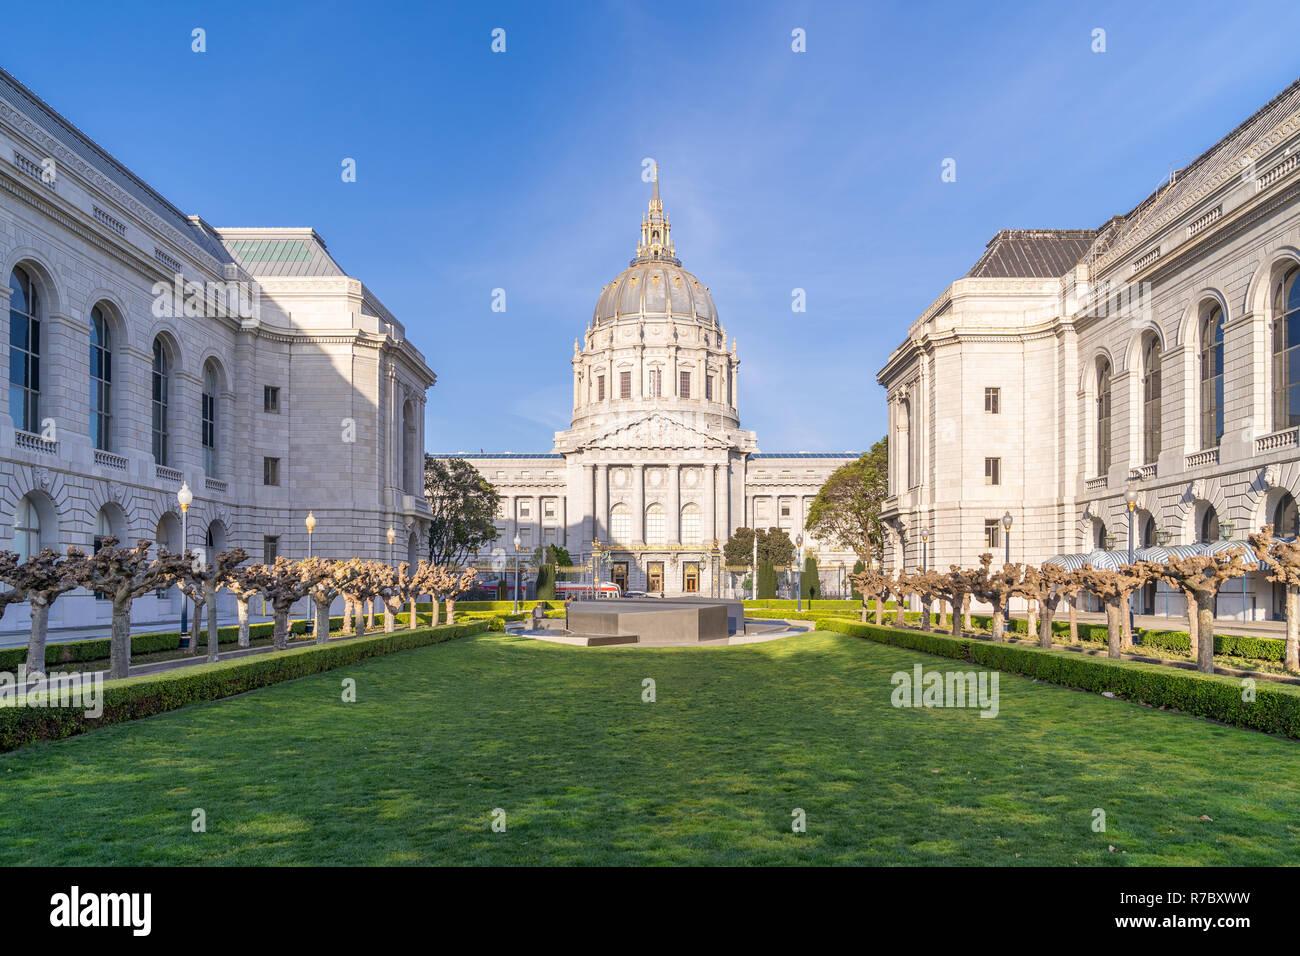 San francisco city hall - Stock Image